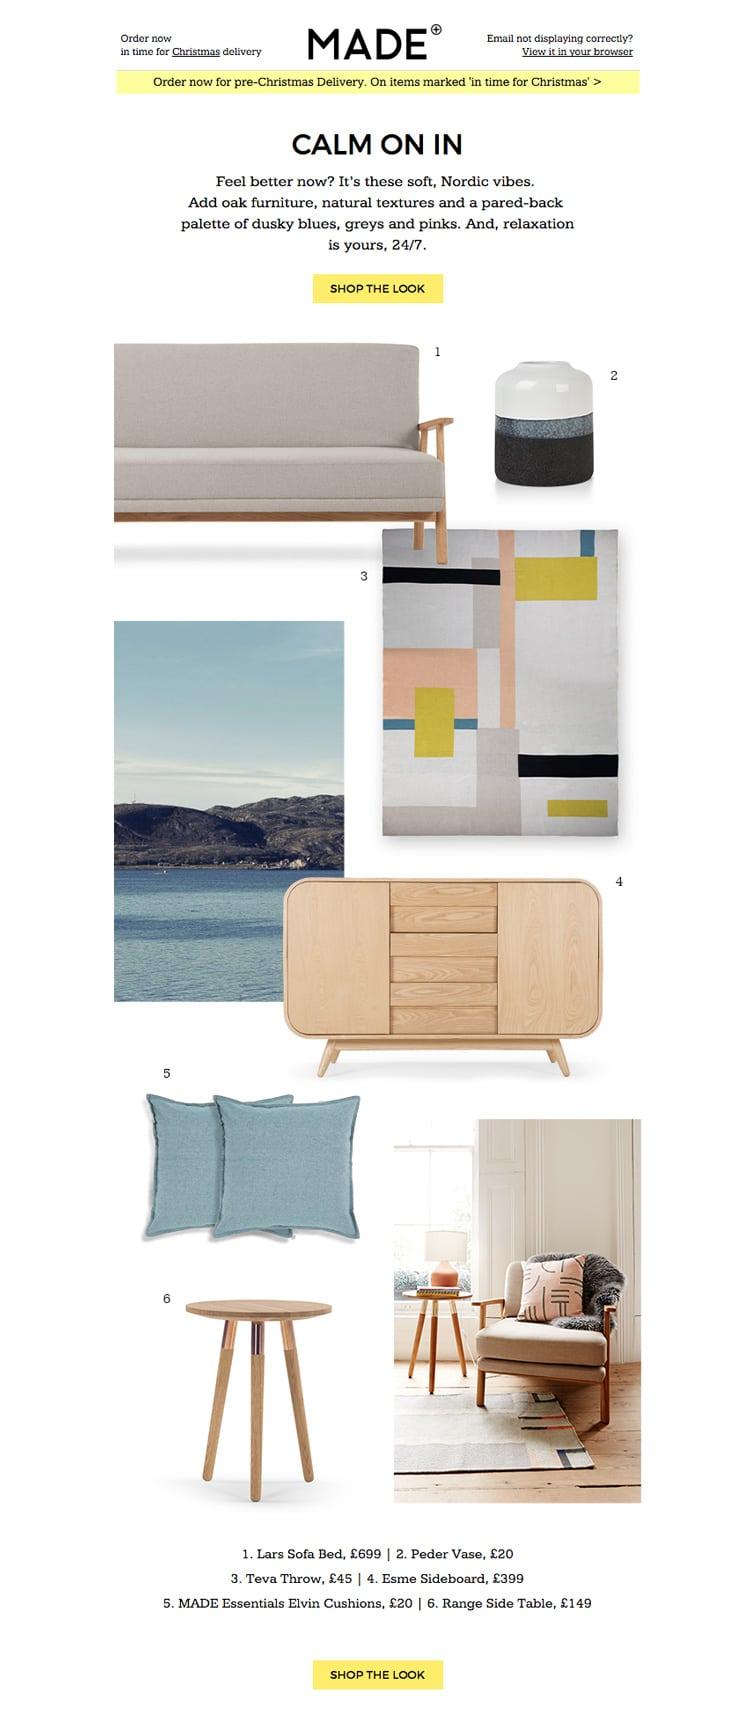 e-newletter email newsletter marketing design layout inspiration furniture made lifestyle